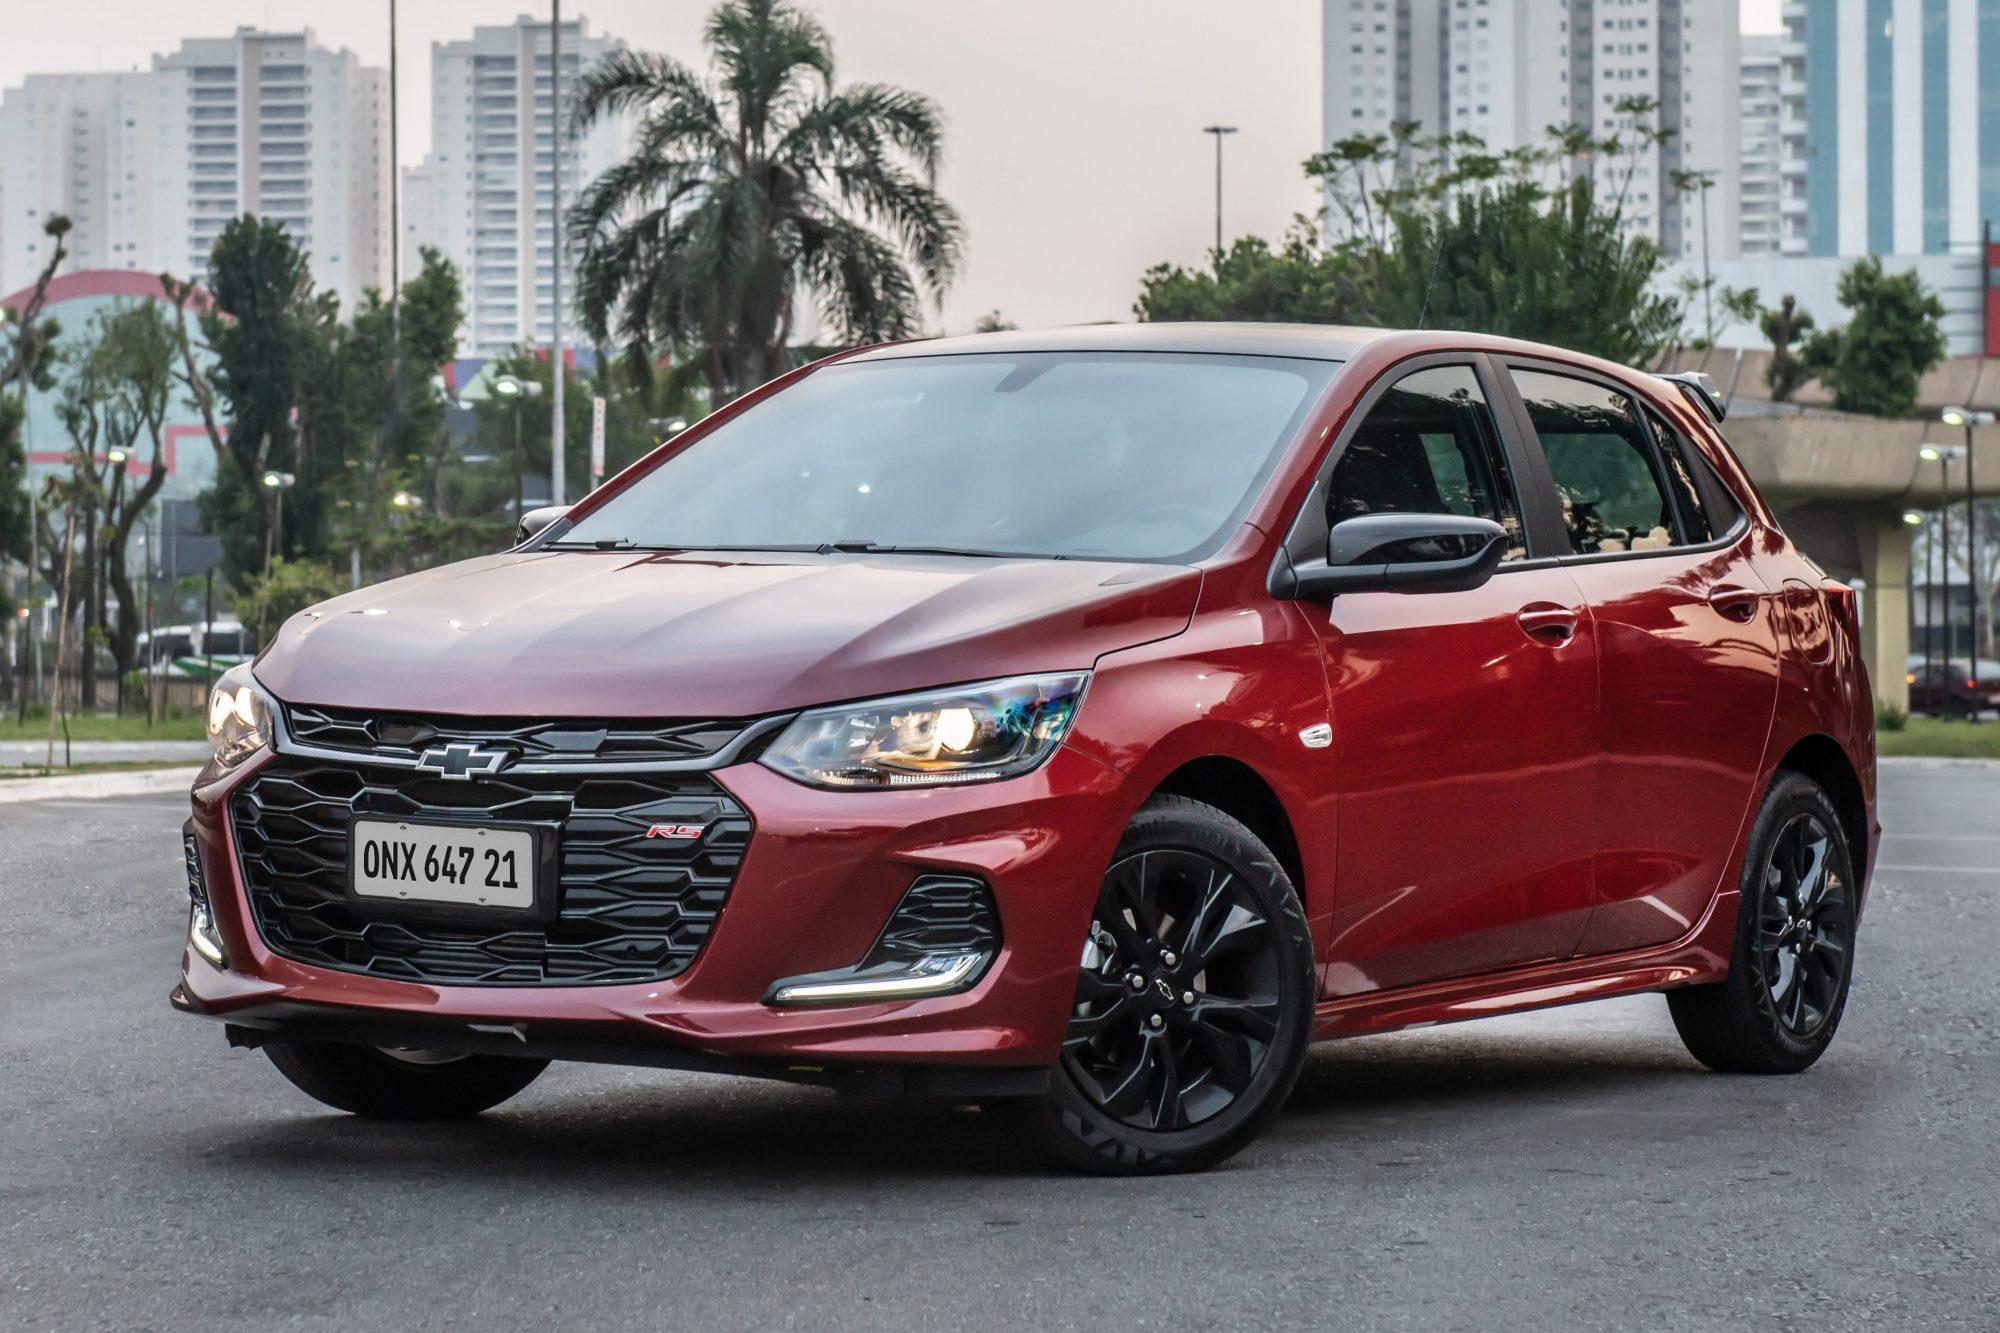 Exclusivo: Chevrolet Onix RS custa R$ 75.590; Midnight sai por R$ 81.390